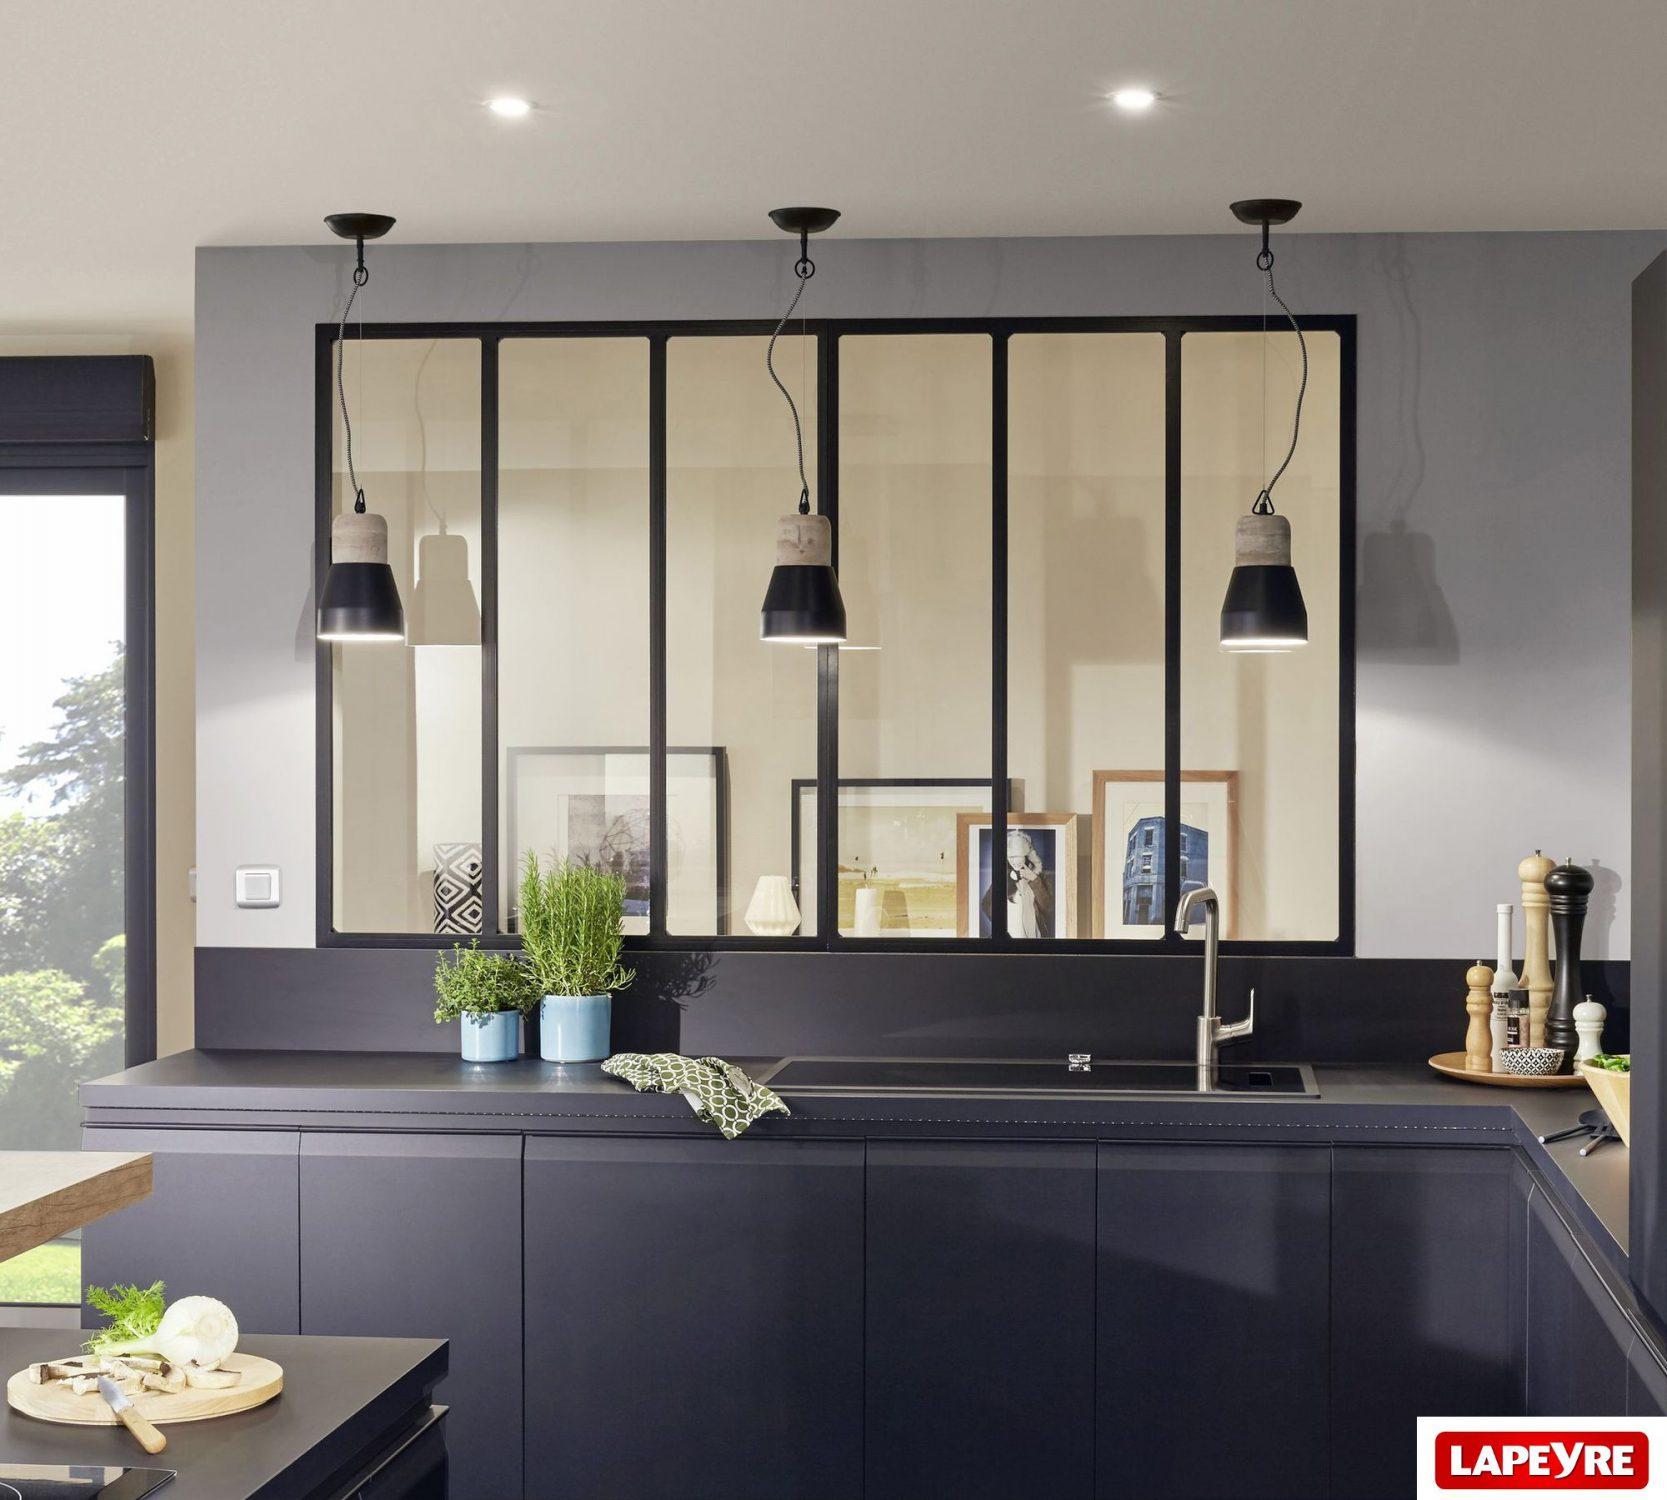 la verri re dans la cuisine vue par cuisinity cuisinity. Black Bedroom Furniture Sets. Home Design Ideas